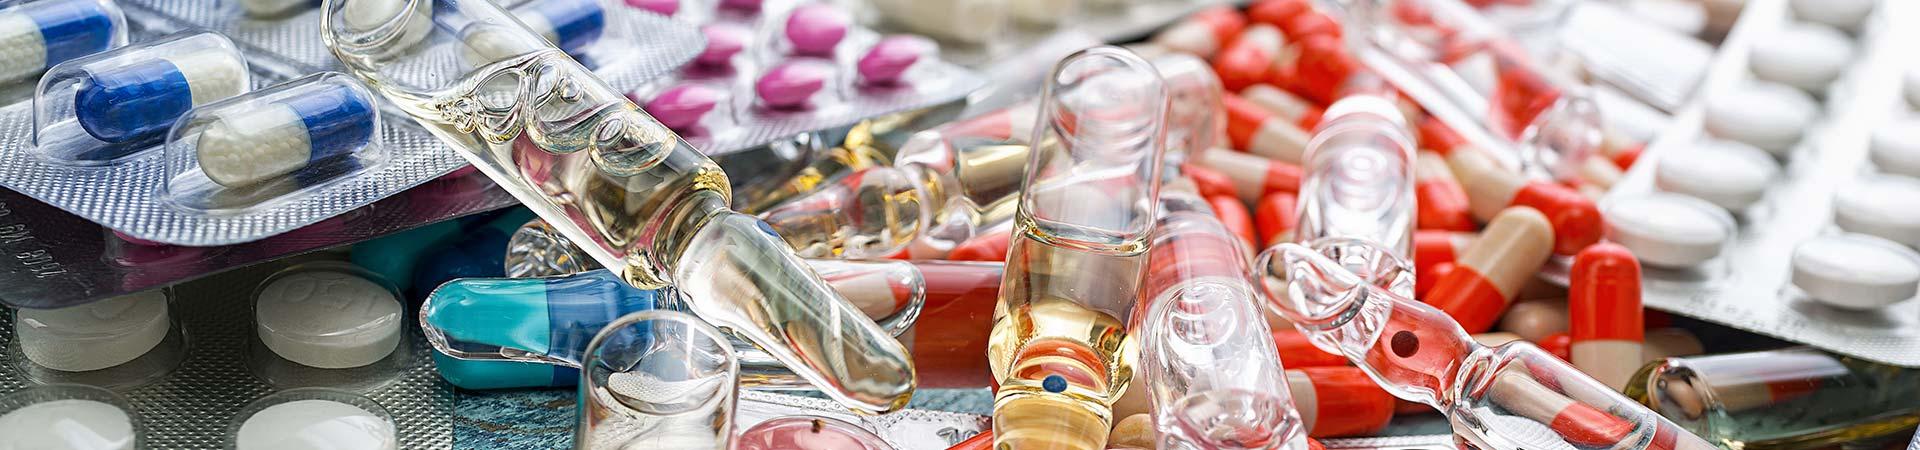 Atlanta Valsartan Drug Lawsuits Lawyer | Colon Cancer Injury